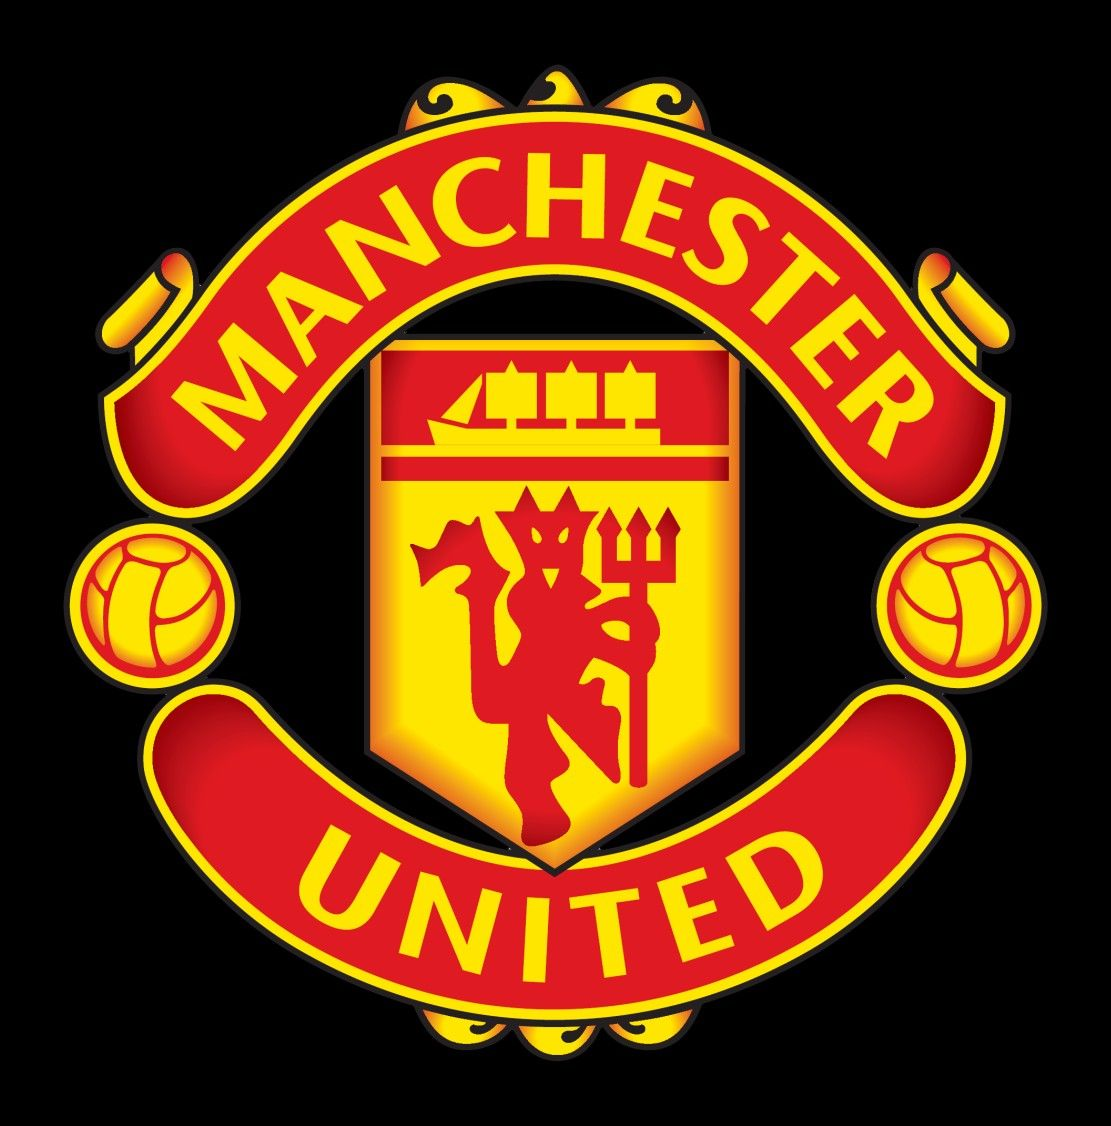 Man Utd Sepak bola, Old trafford, Manchester united